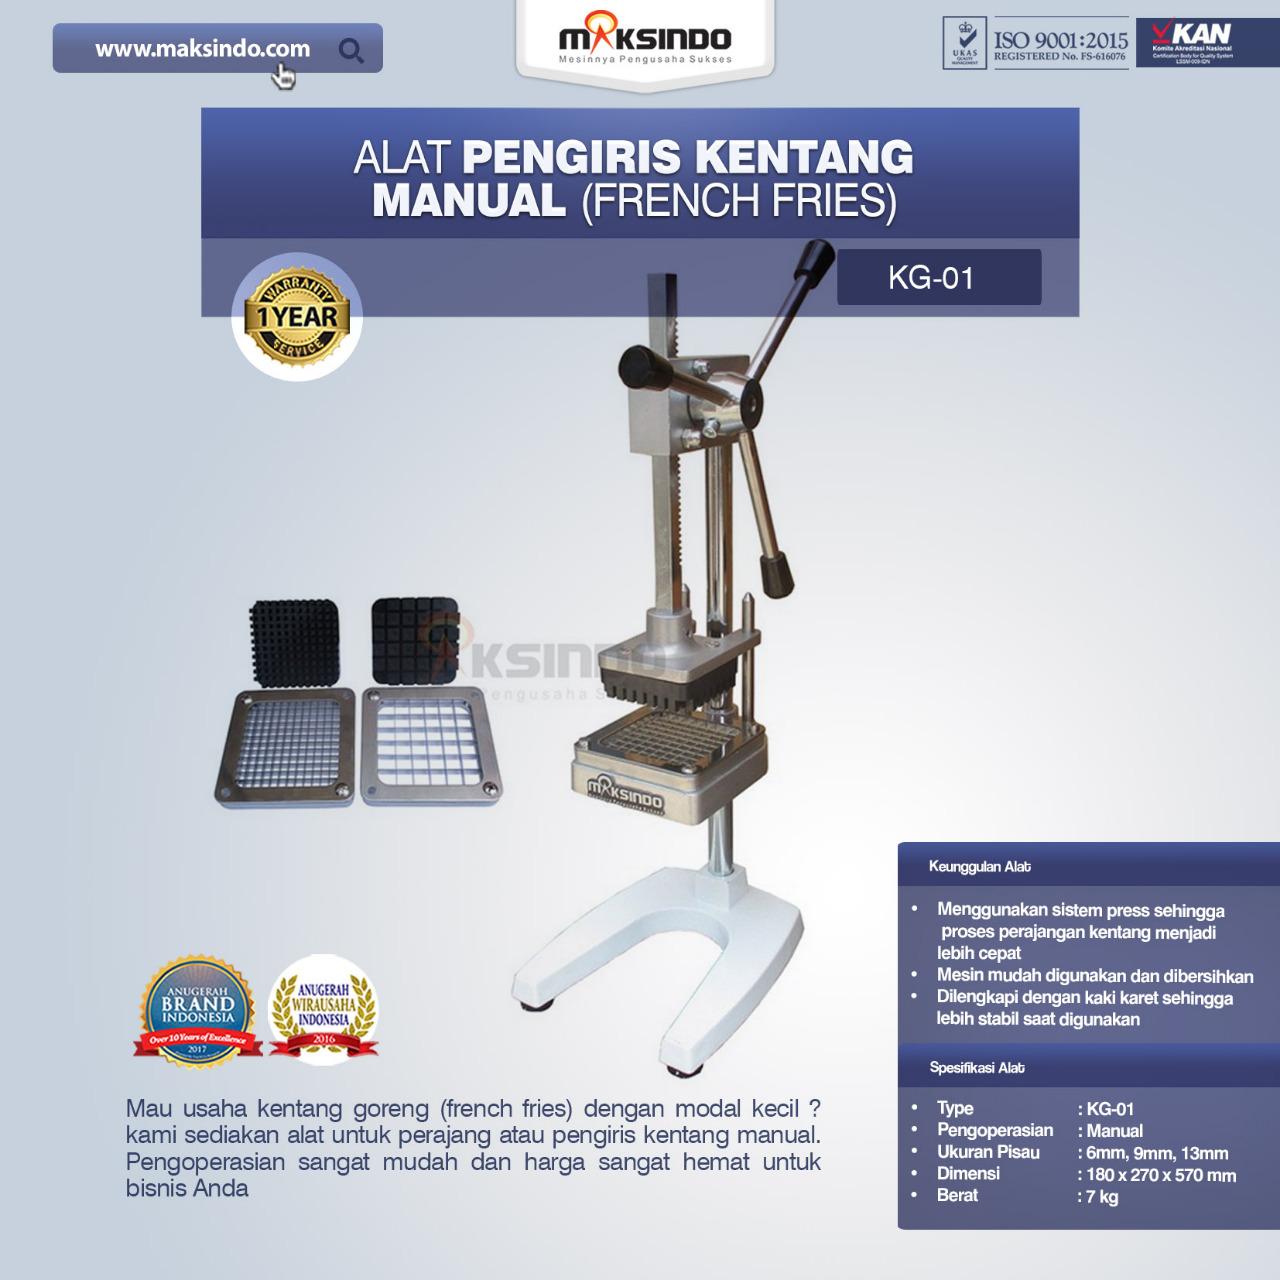 Jual Alat Pengiris Kentang Manual (french fries) di Malang